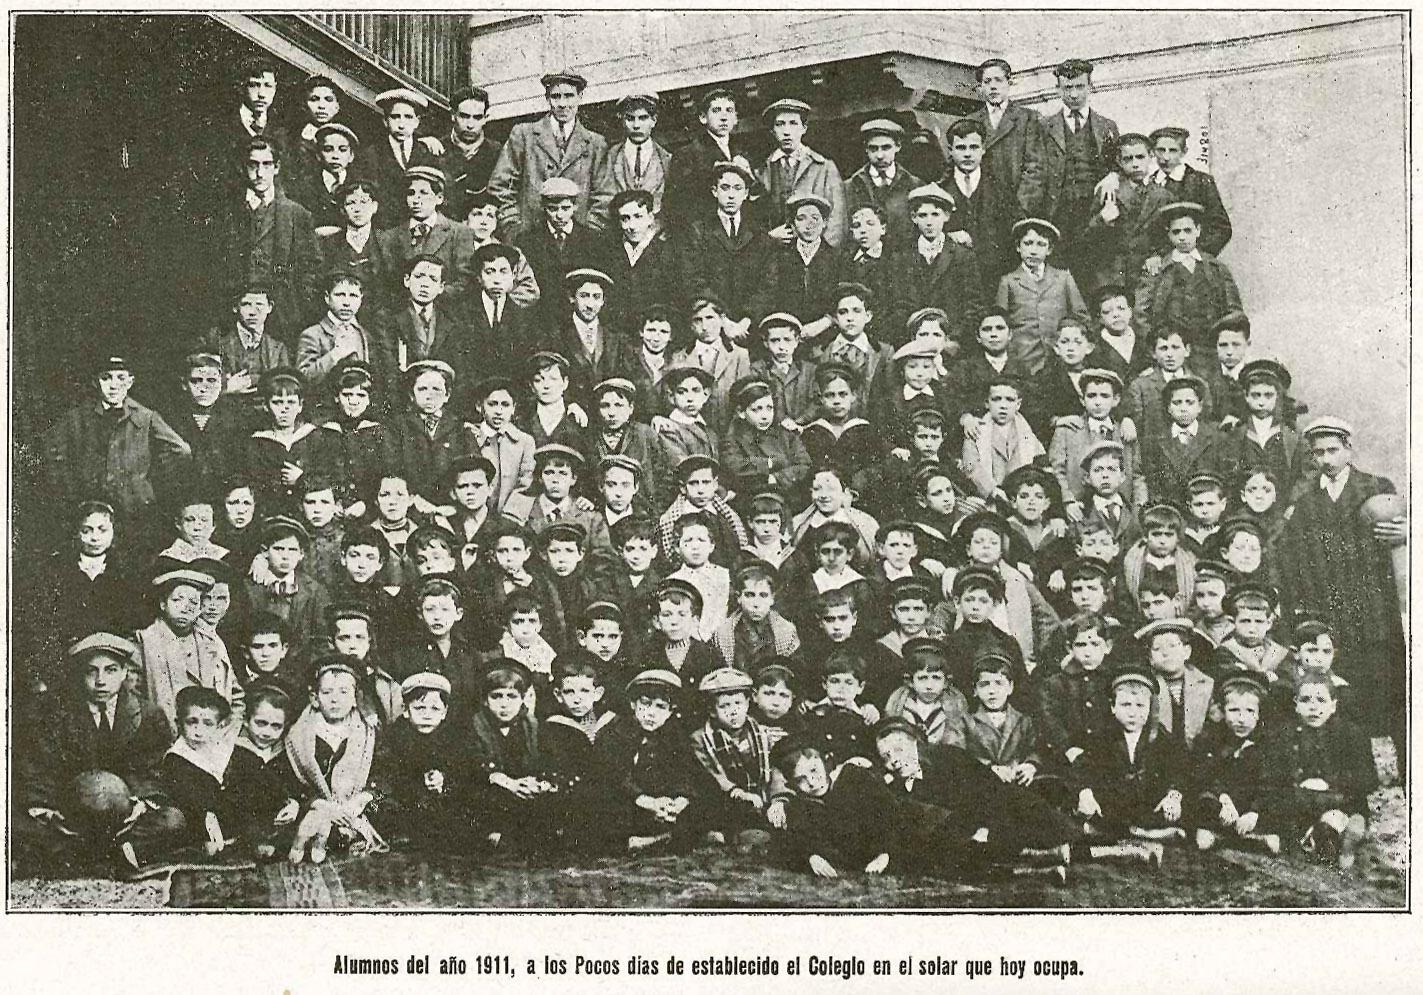 colegio sagrada familia de santa fe: